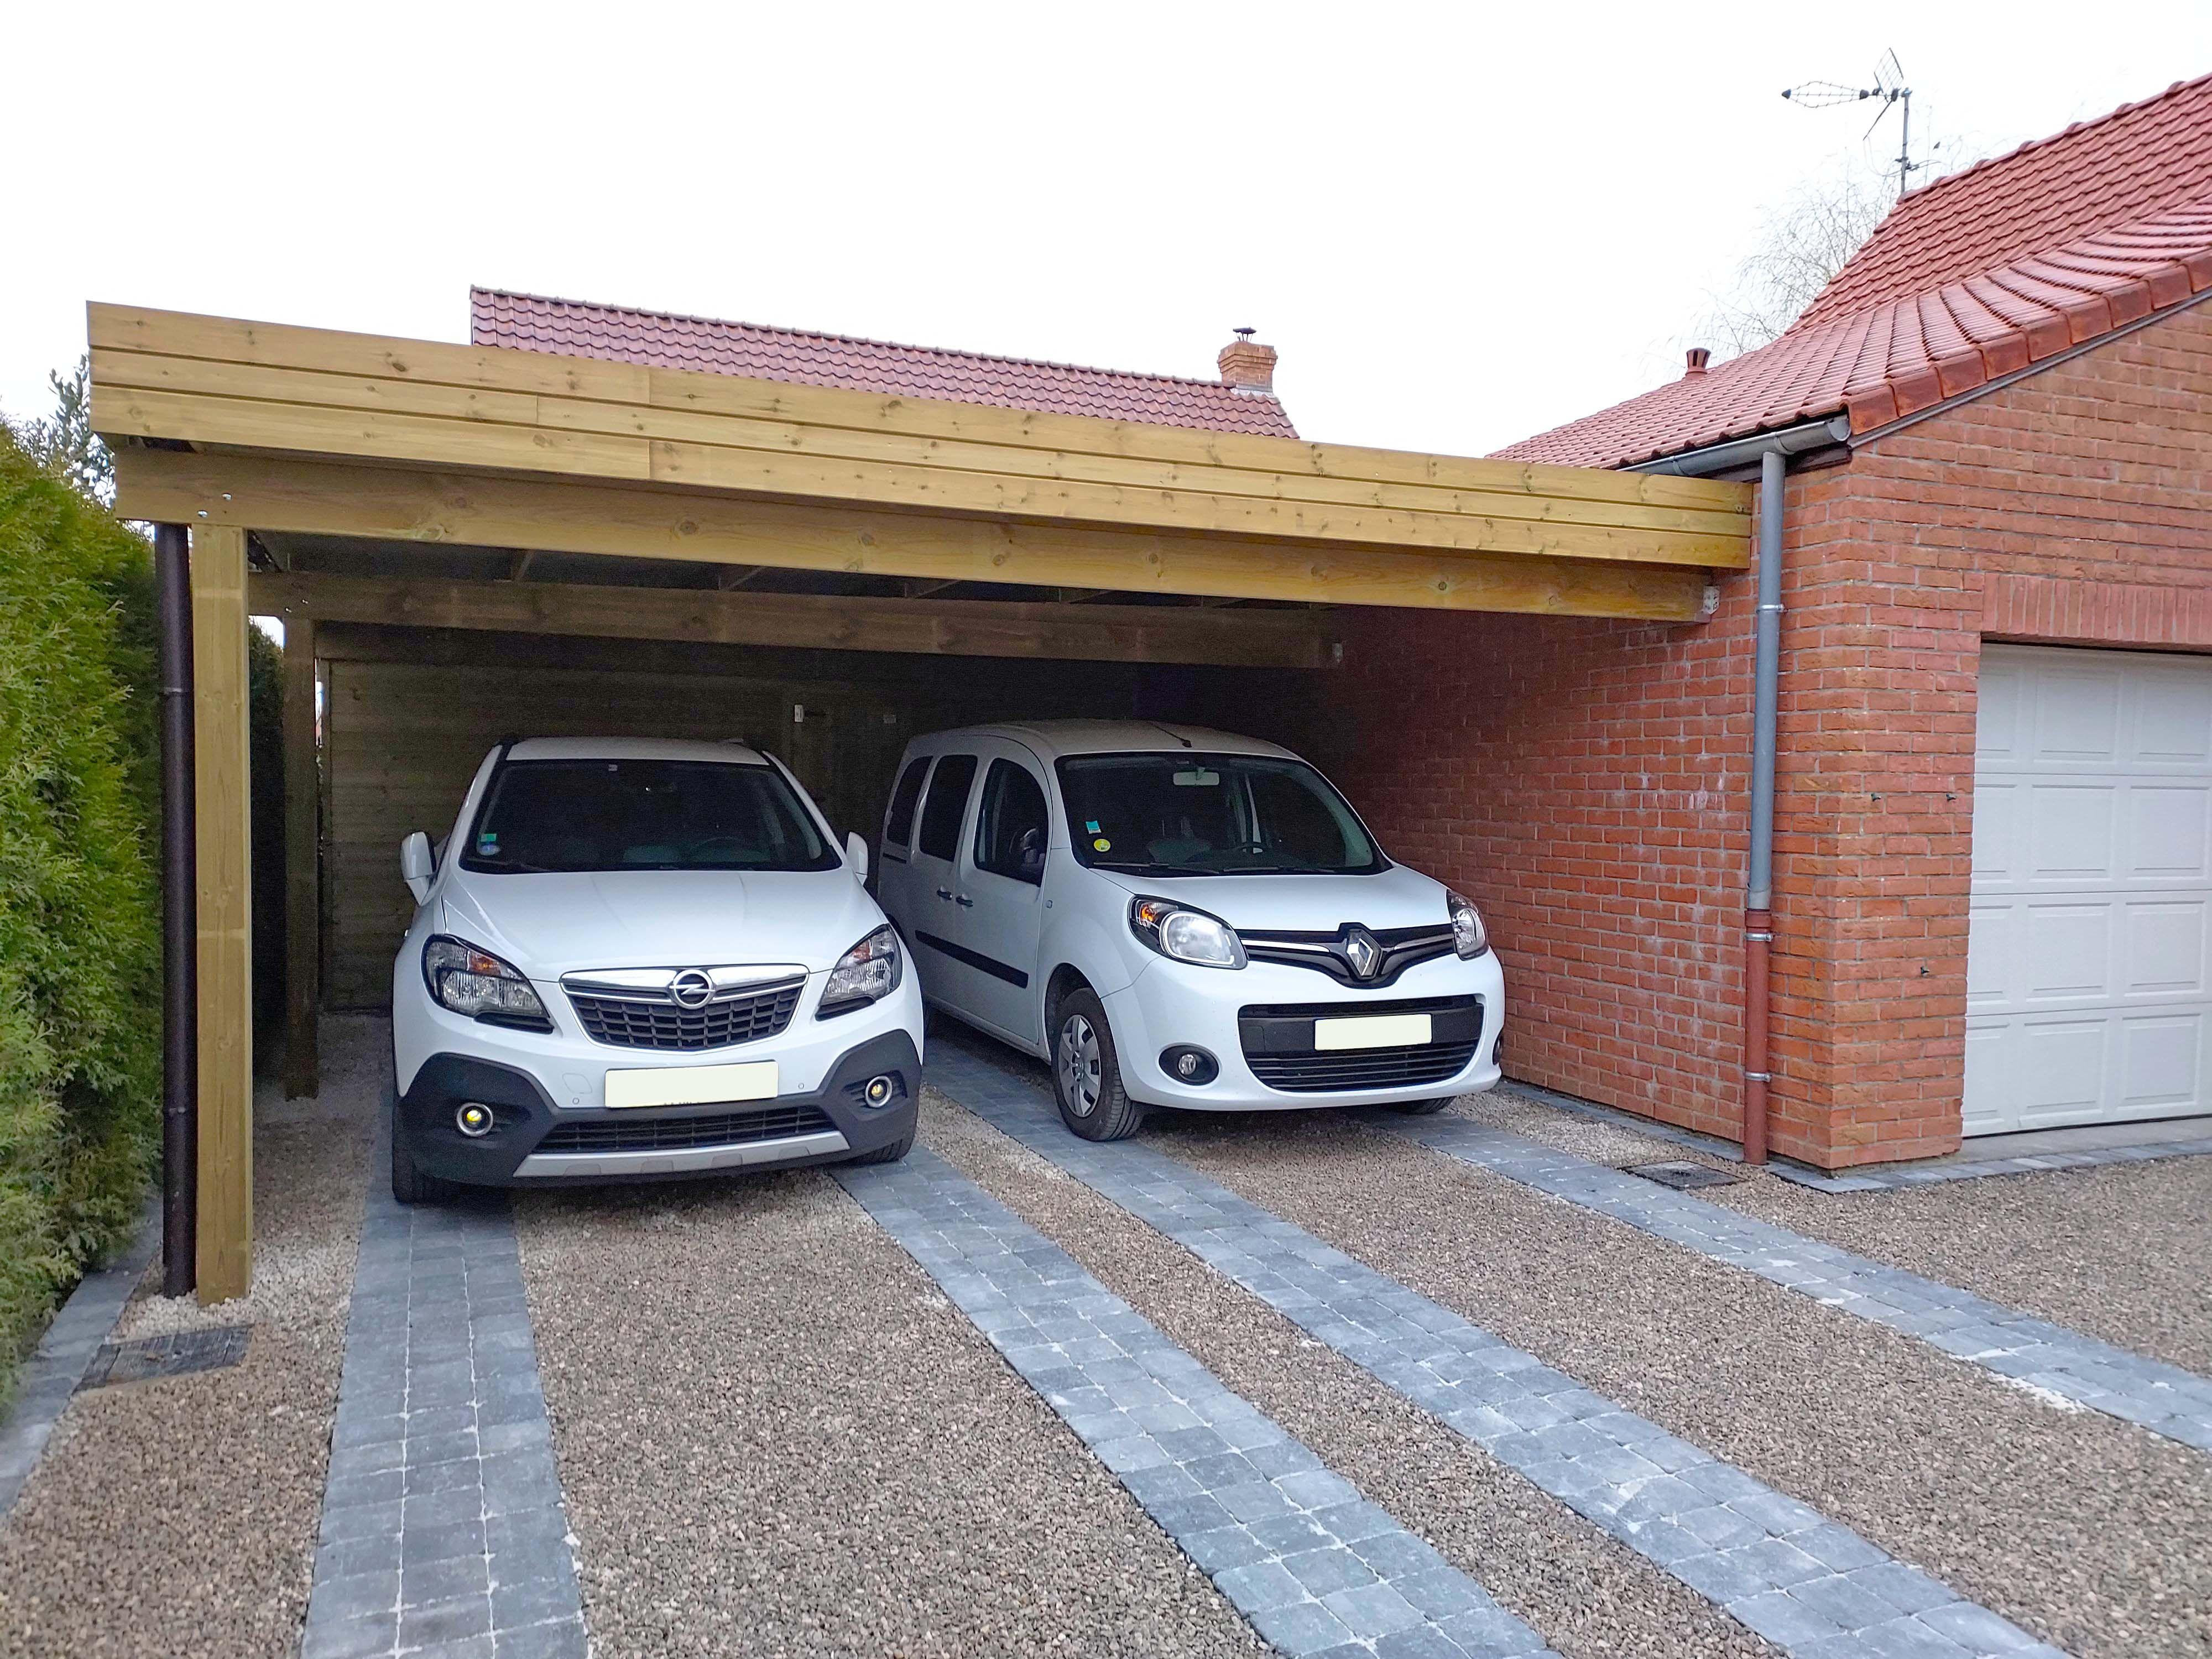 Double Carport Moderne en Bois